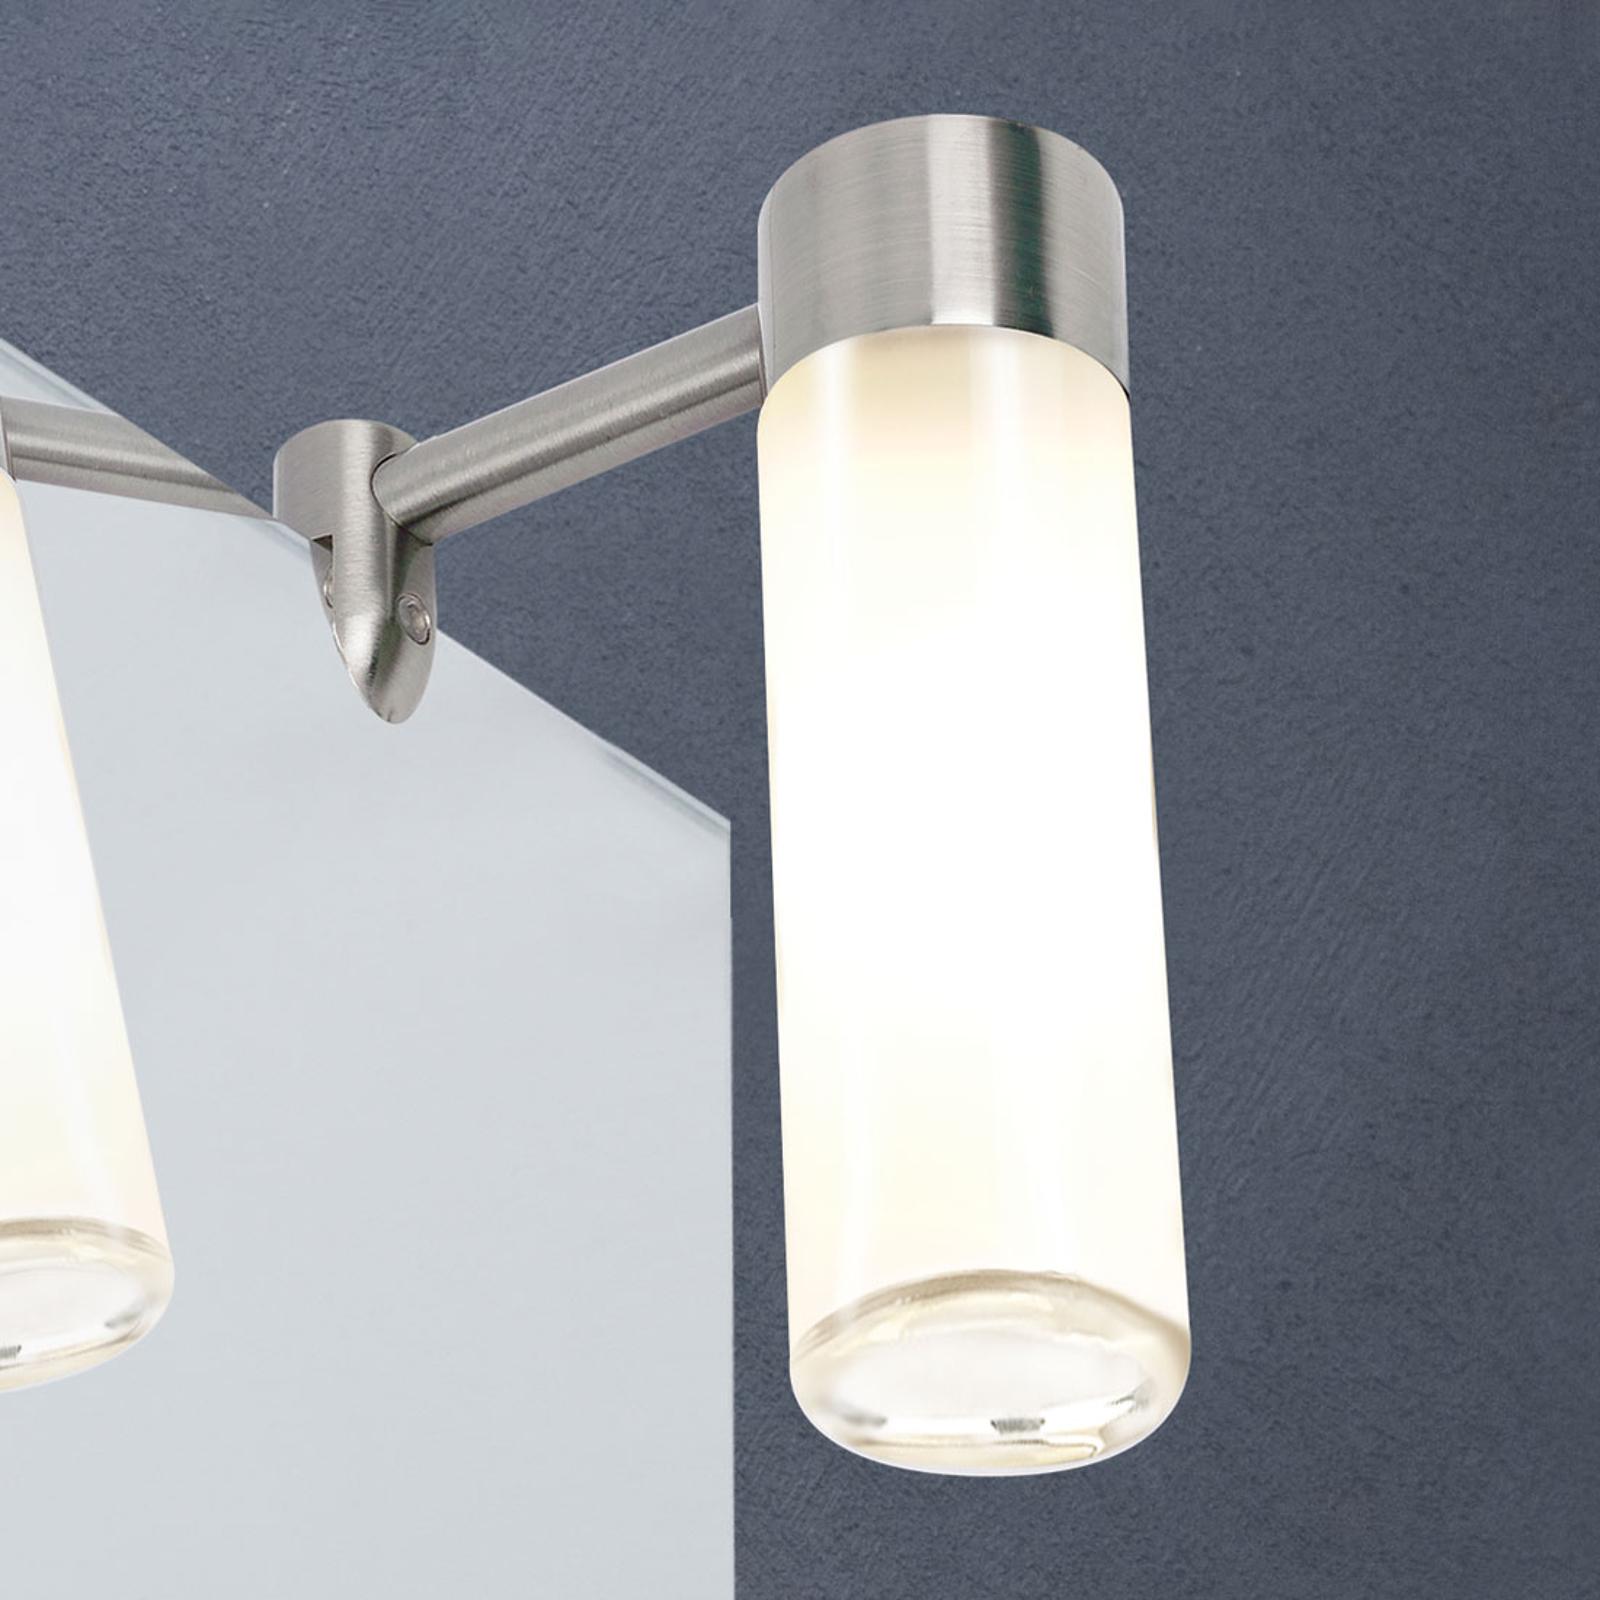 Paulmann Vitrino luce per specchio a LED